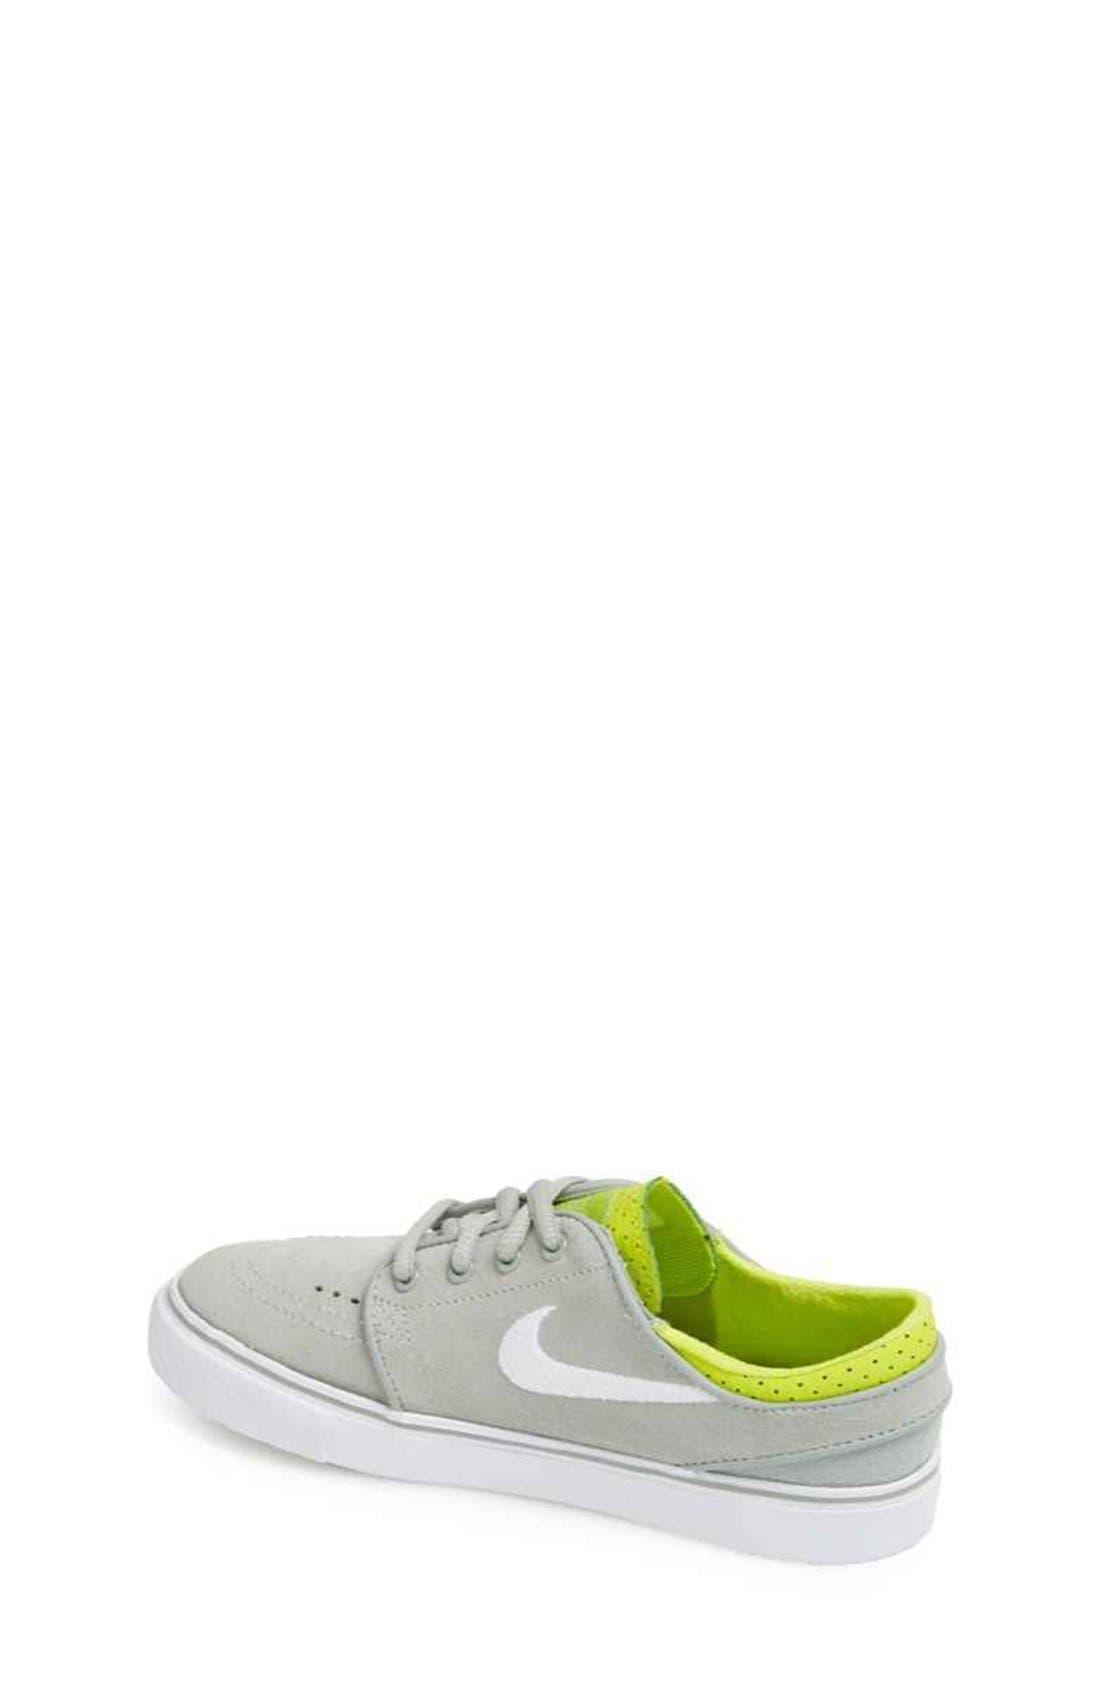 'Stefan Janoski' Sneaker,                             Alternate thumbnail 22, color,